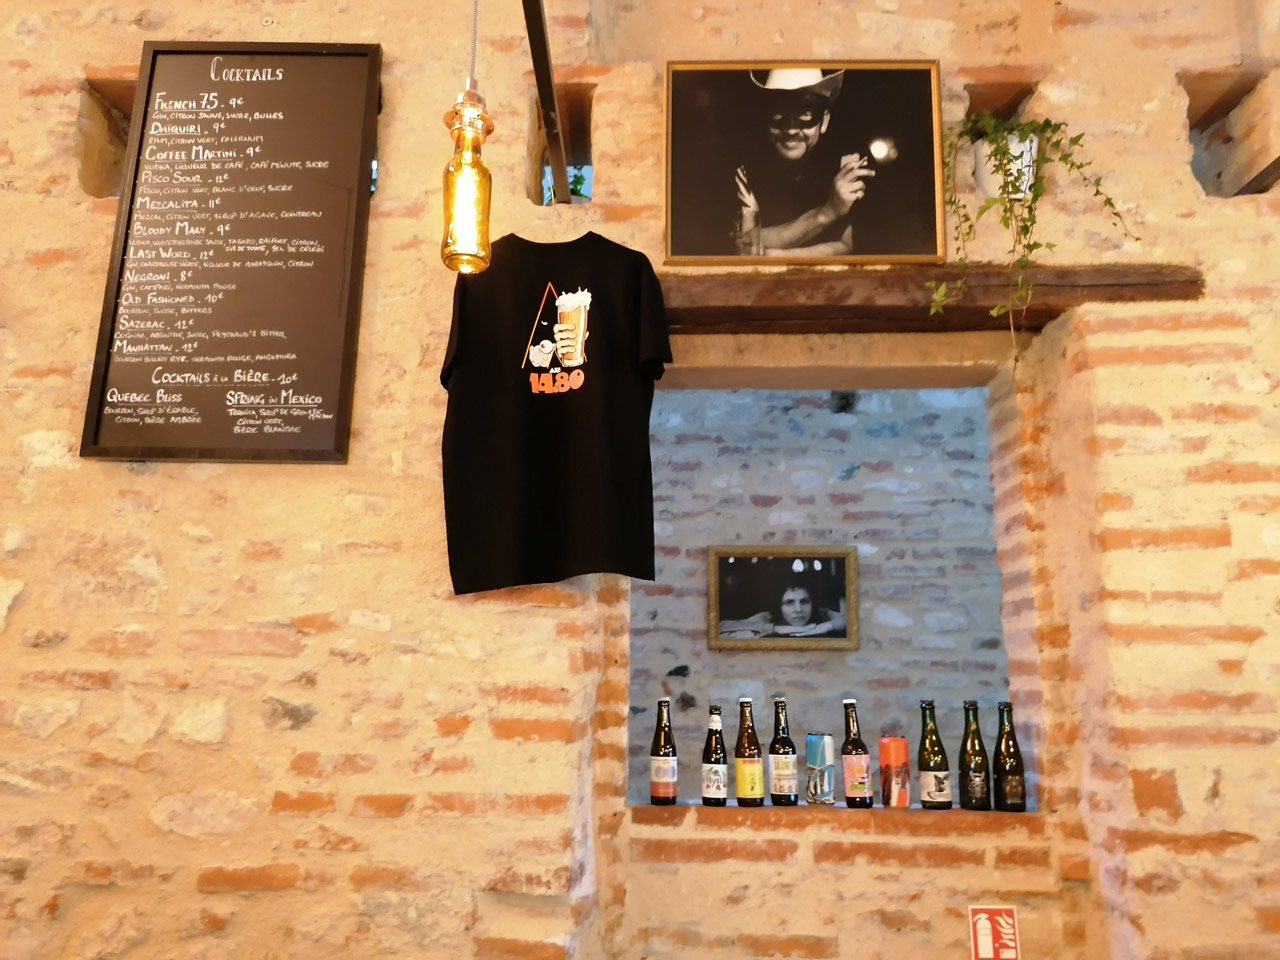 Restaurant Albi – 14.80